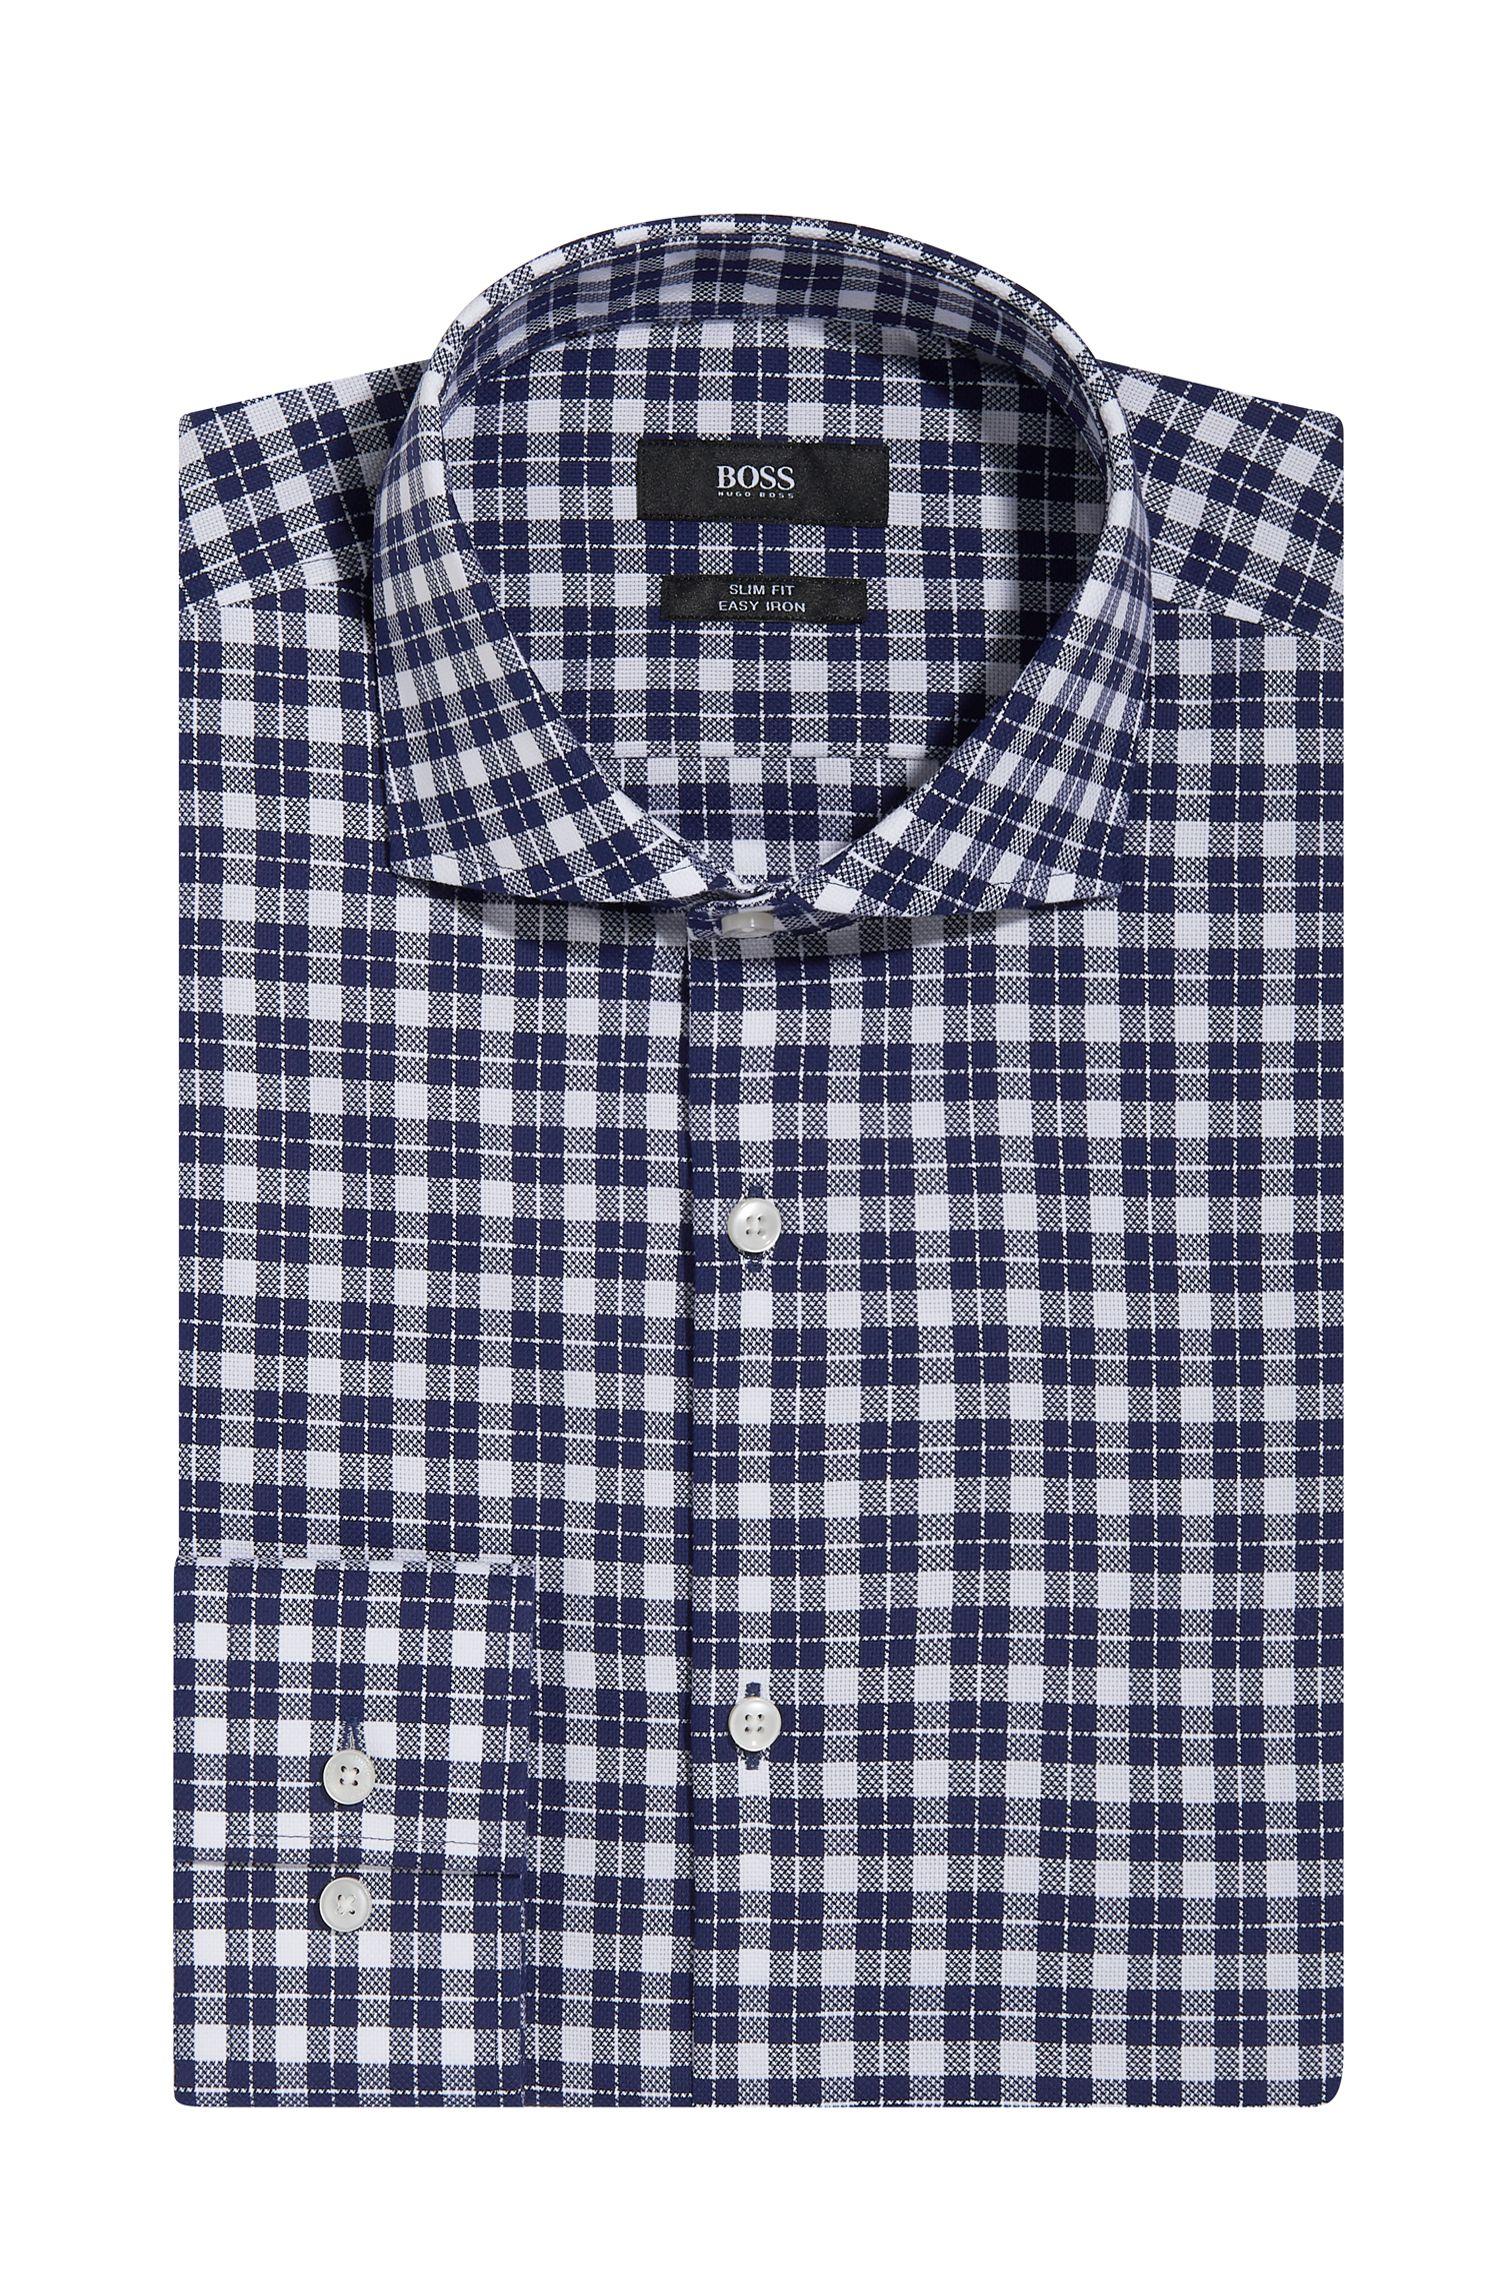 'Jason' | Slim Fit, Check Easy Iron Cotton Dress Shirt